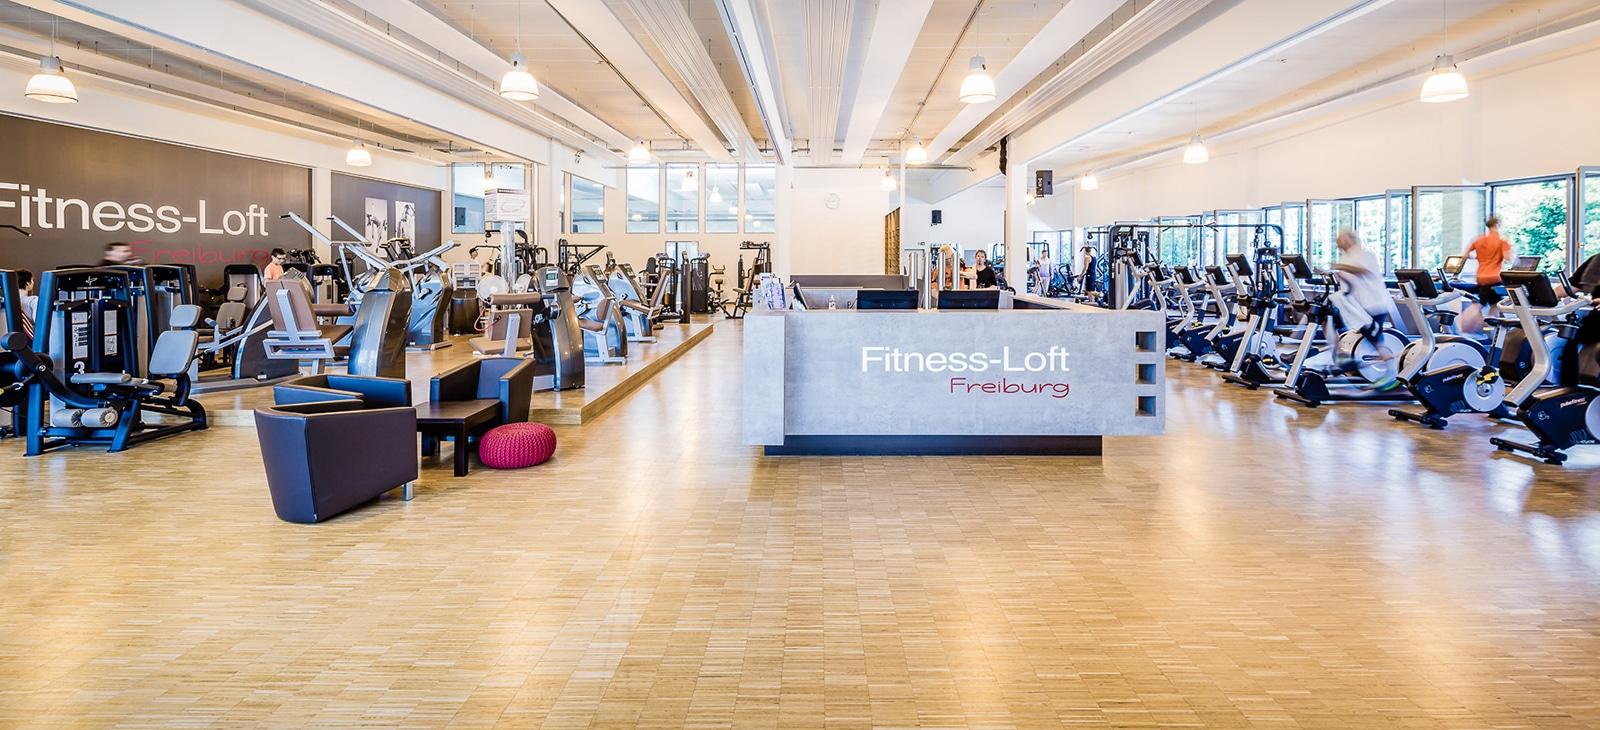 Fitness-Loft-Freiburg-Haid-1600x730px